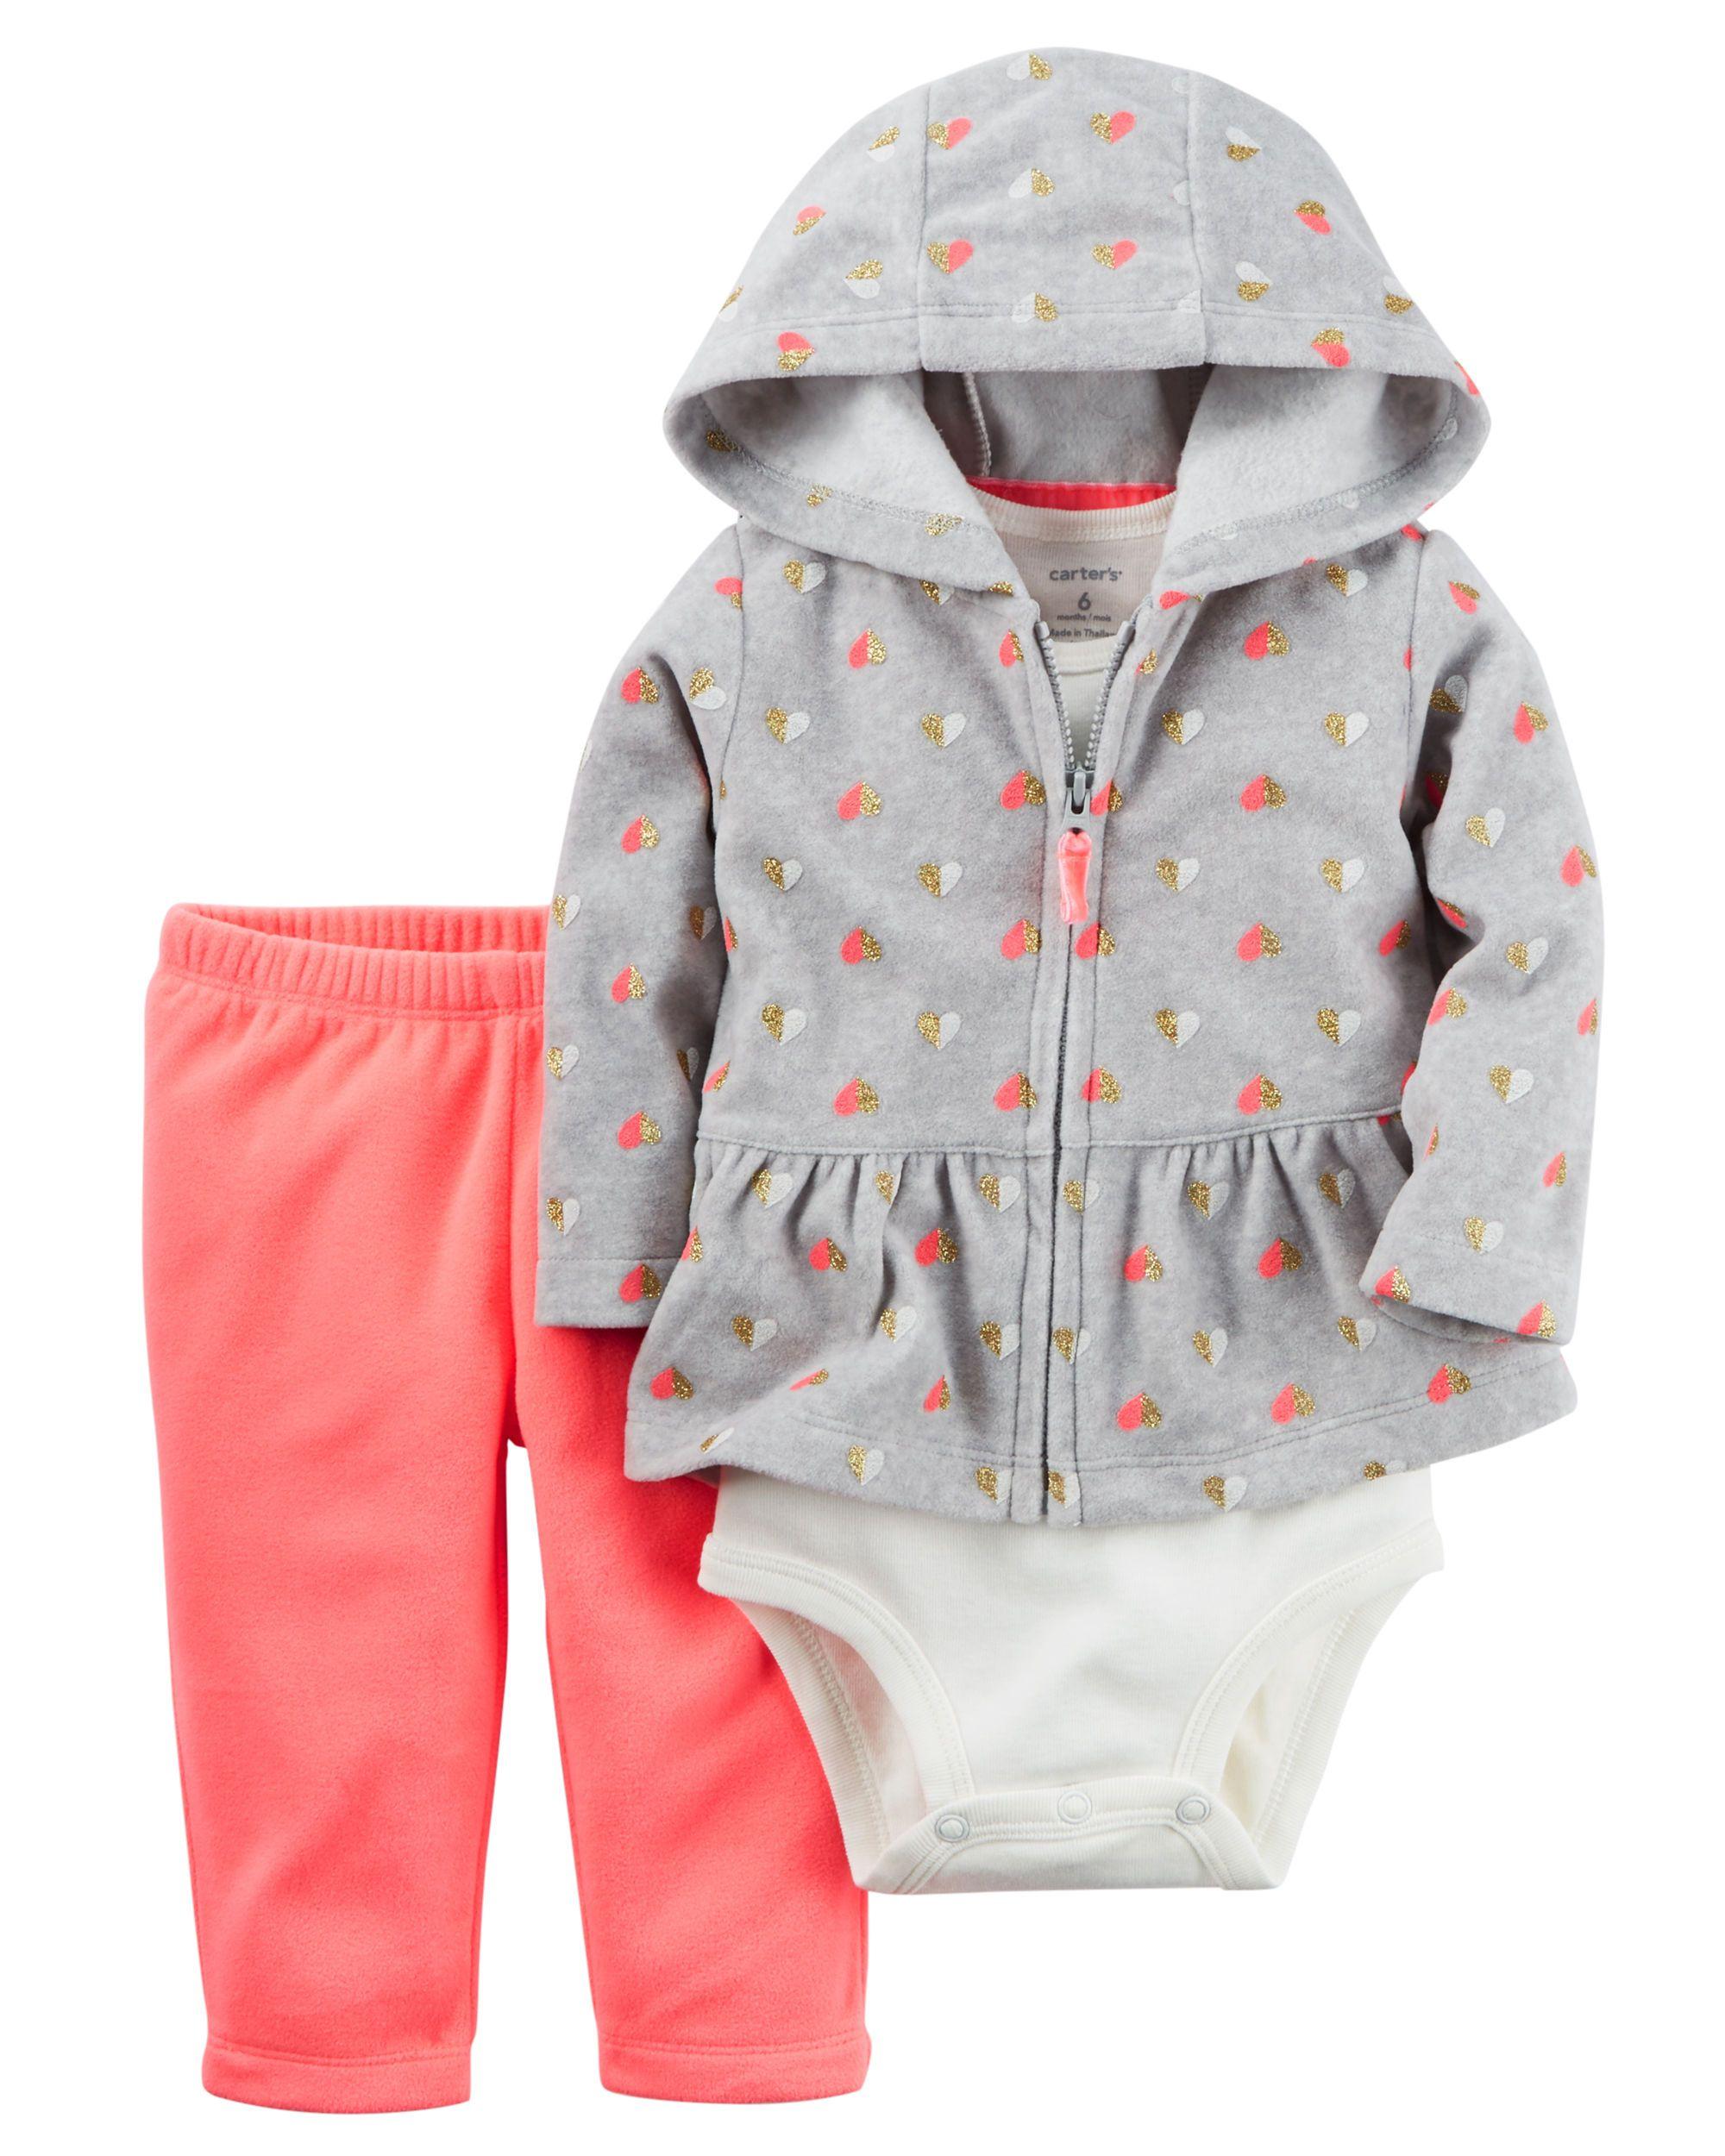 3-Piece Little Jacket Set   Babies clothes and Babies